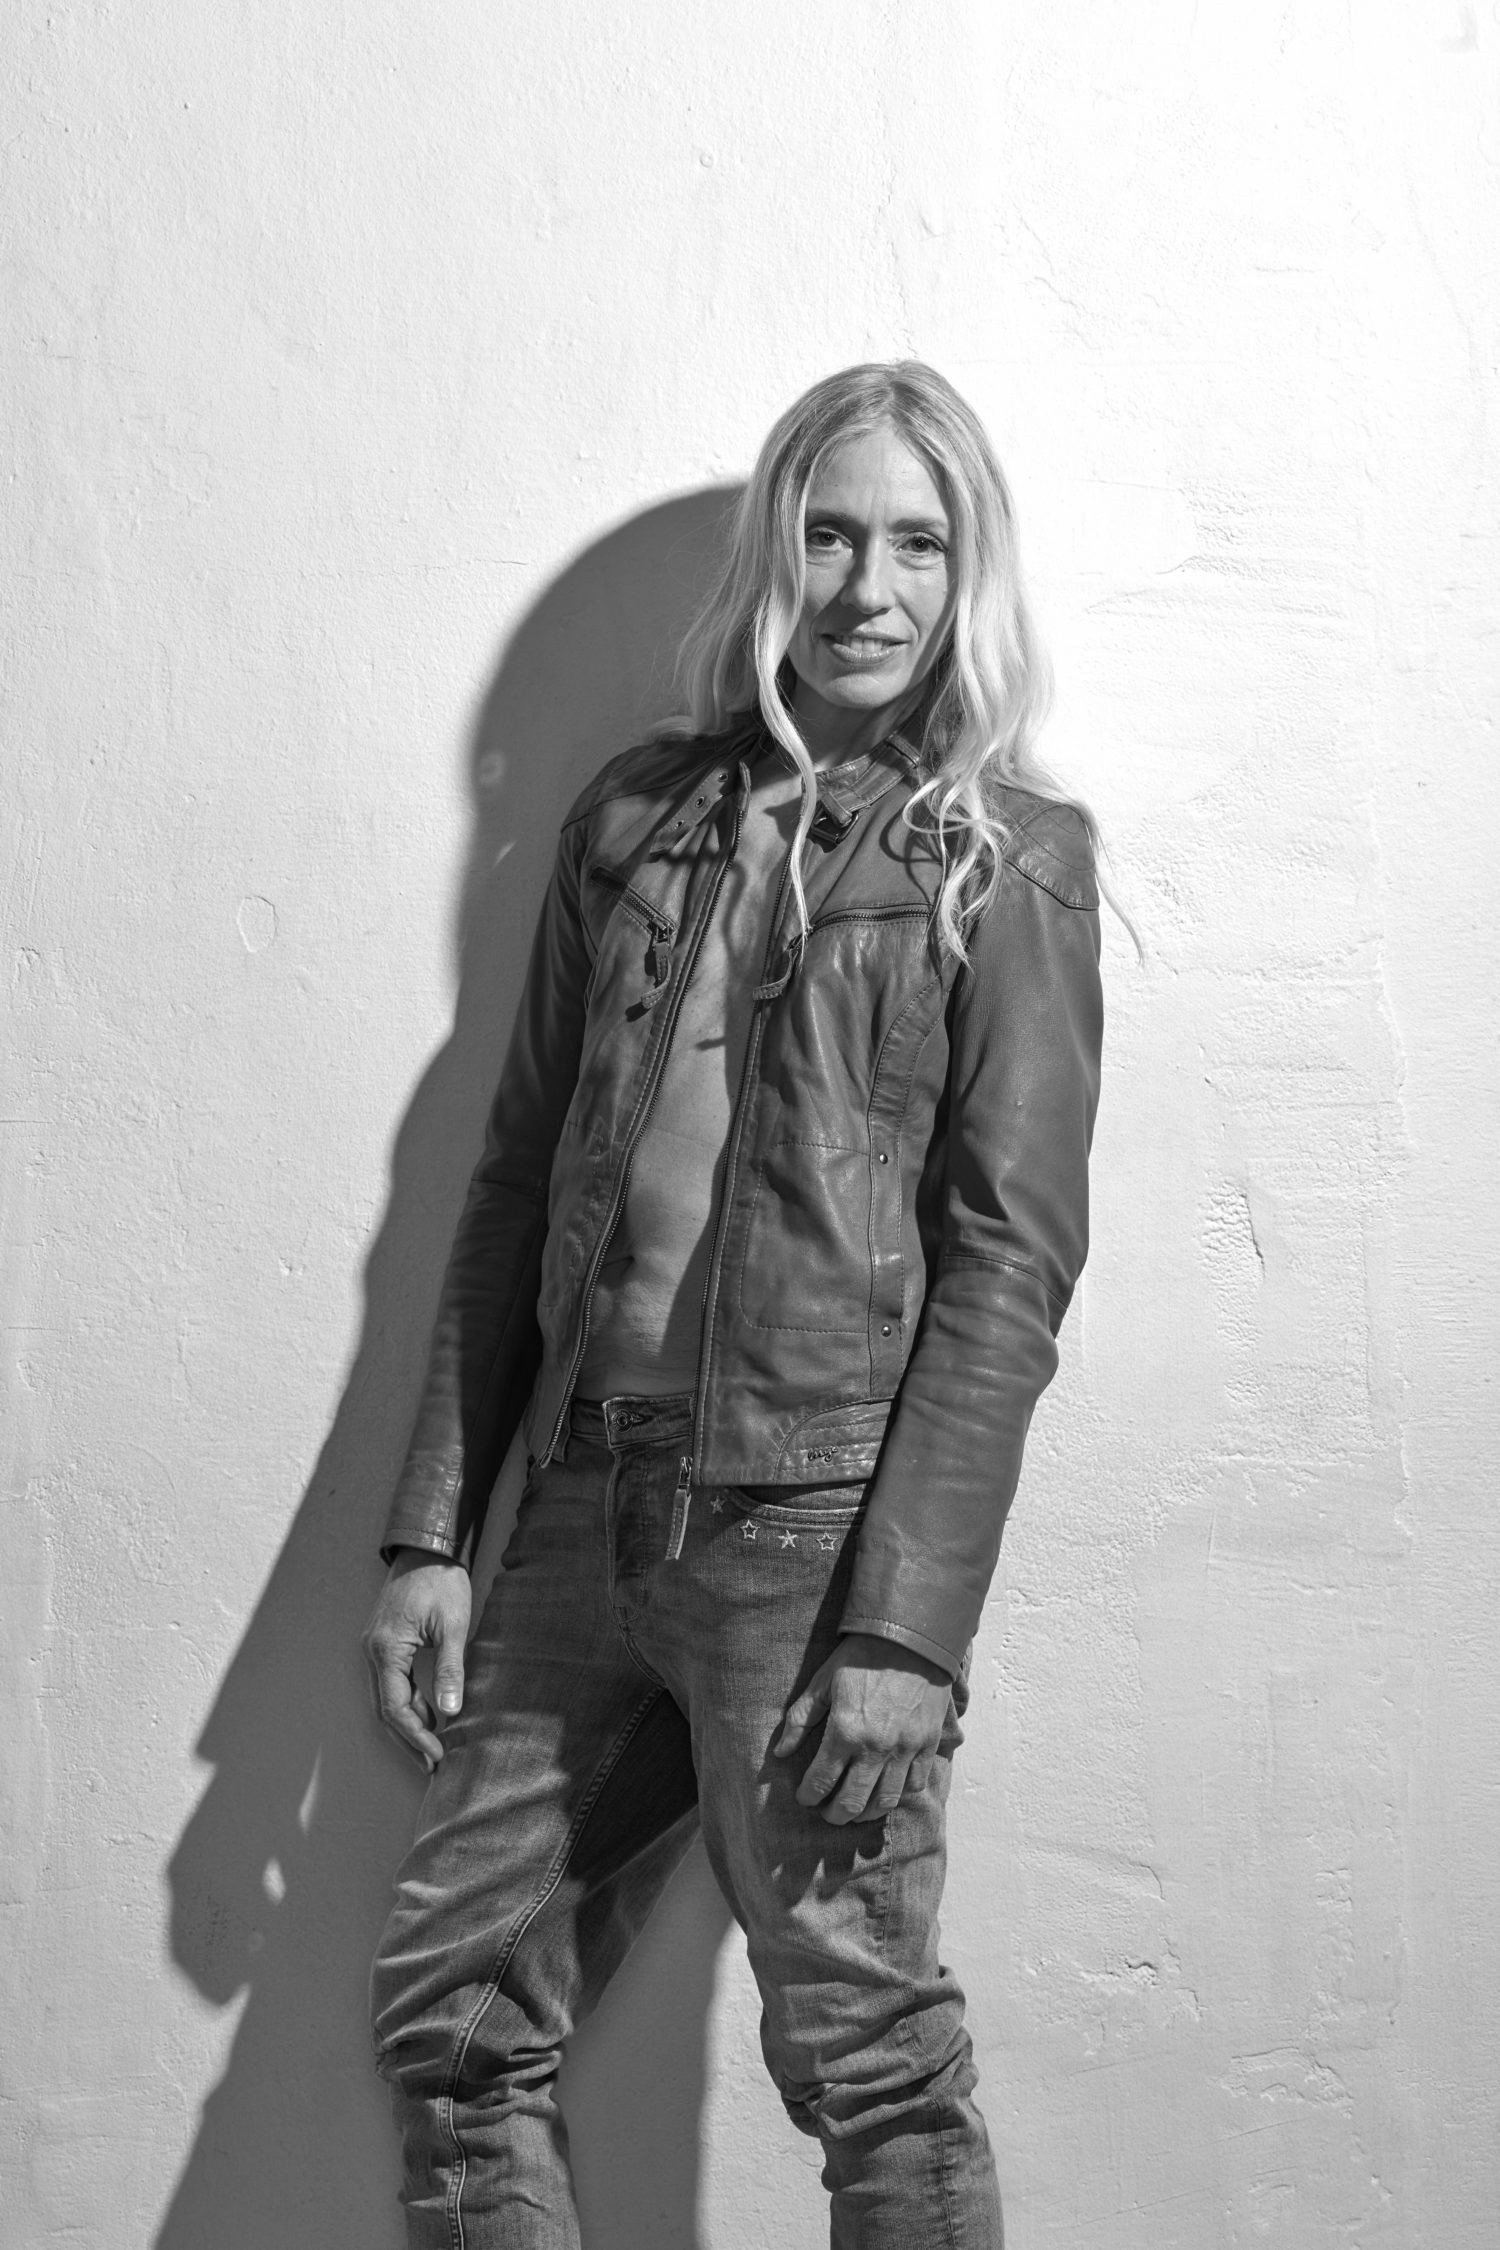 Radioeins-Musikchefin Anja Caspary. Foto: Annette Apel